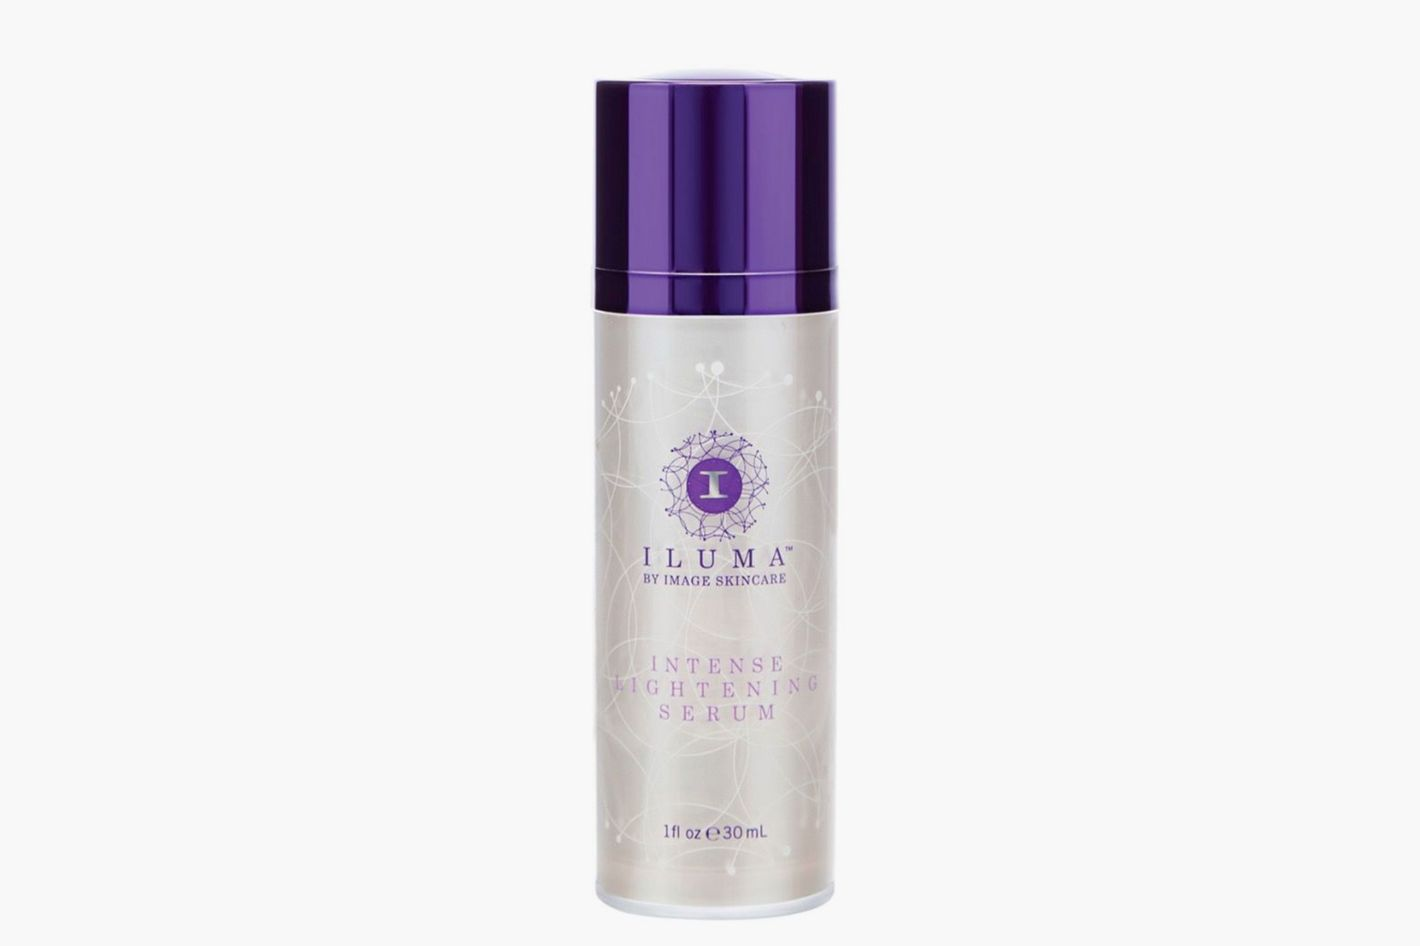 Image Skin Care Iluma Intense Brightening Serum